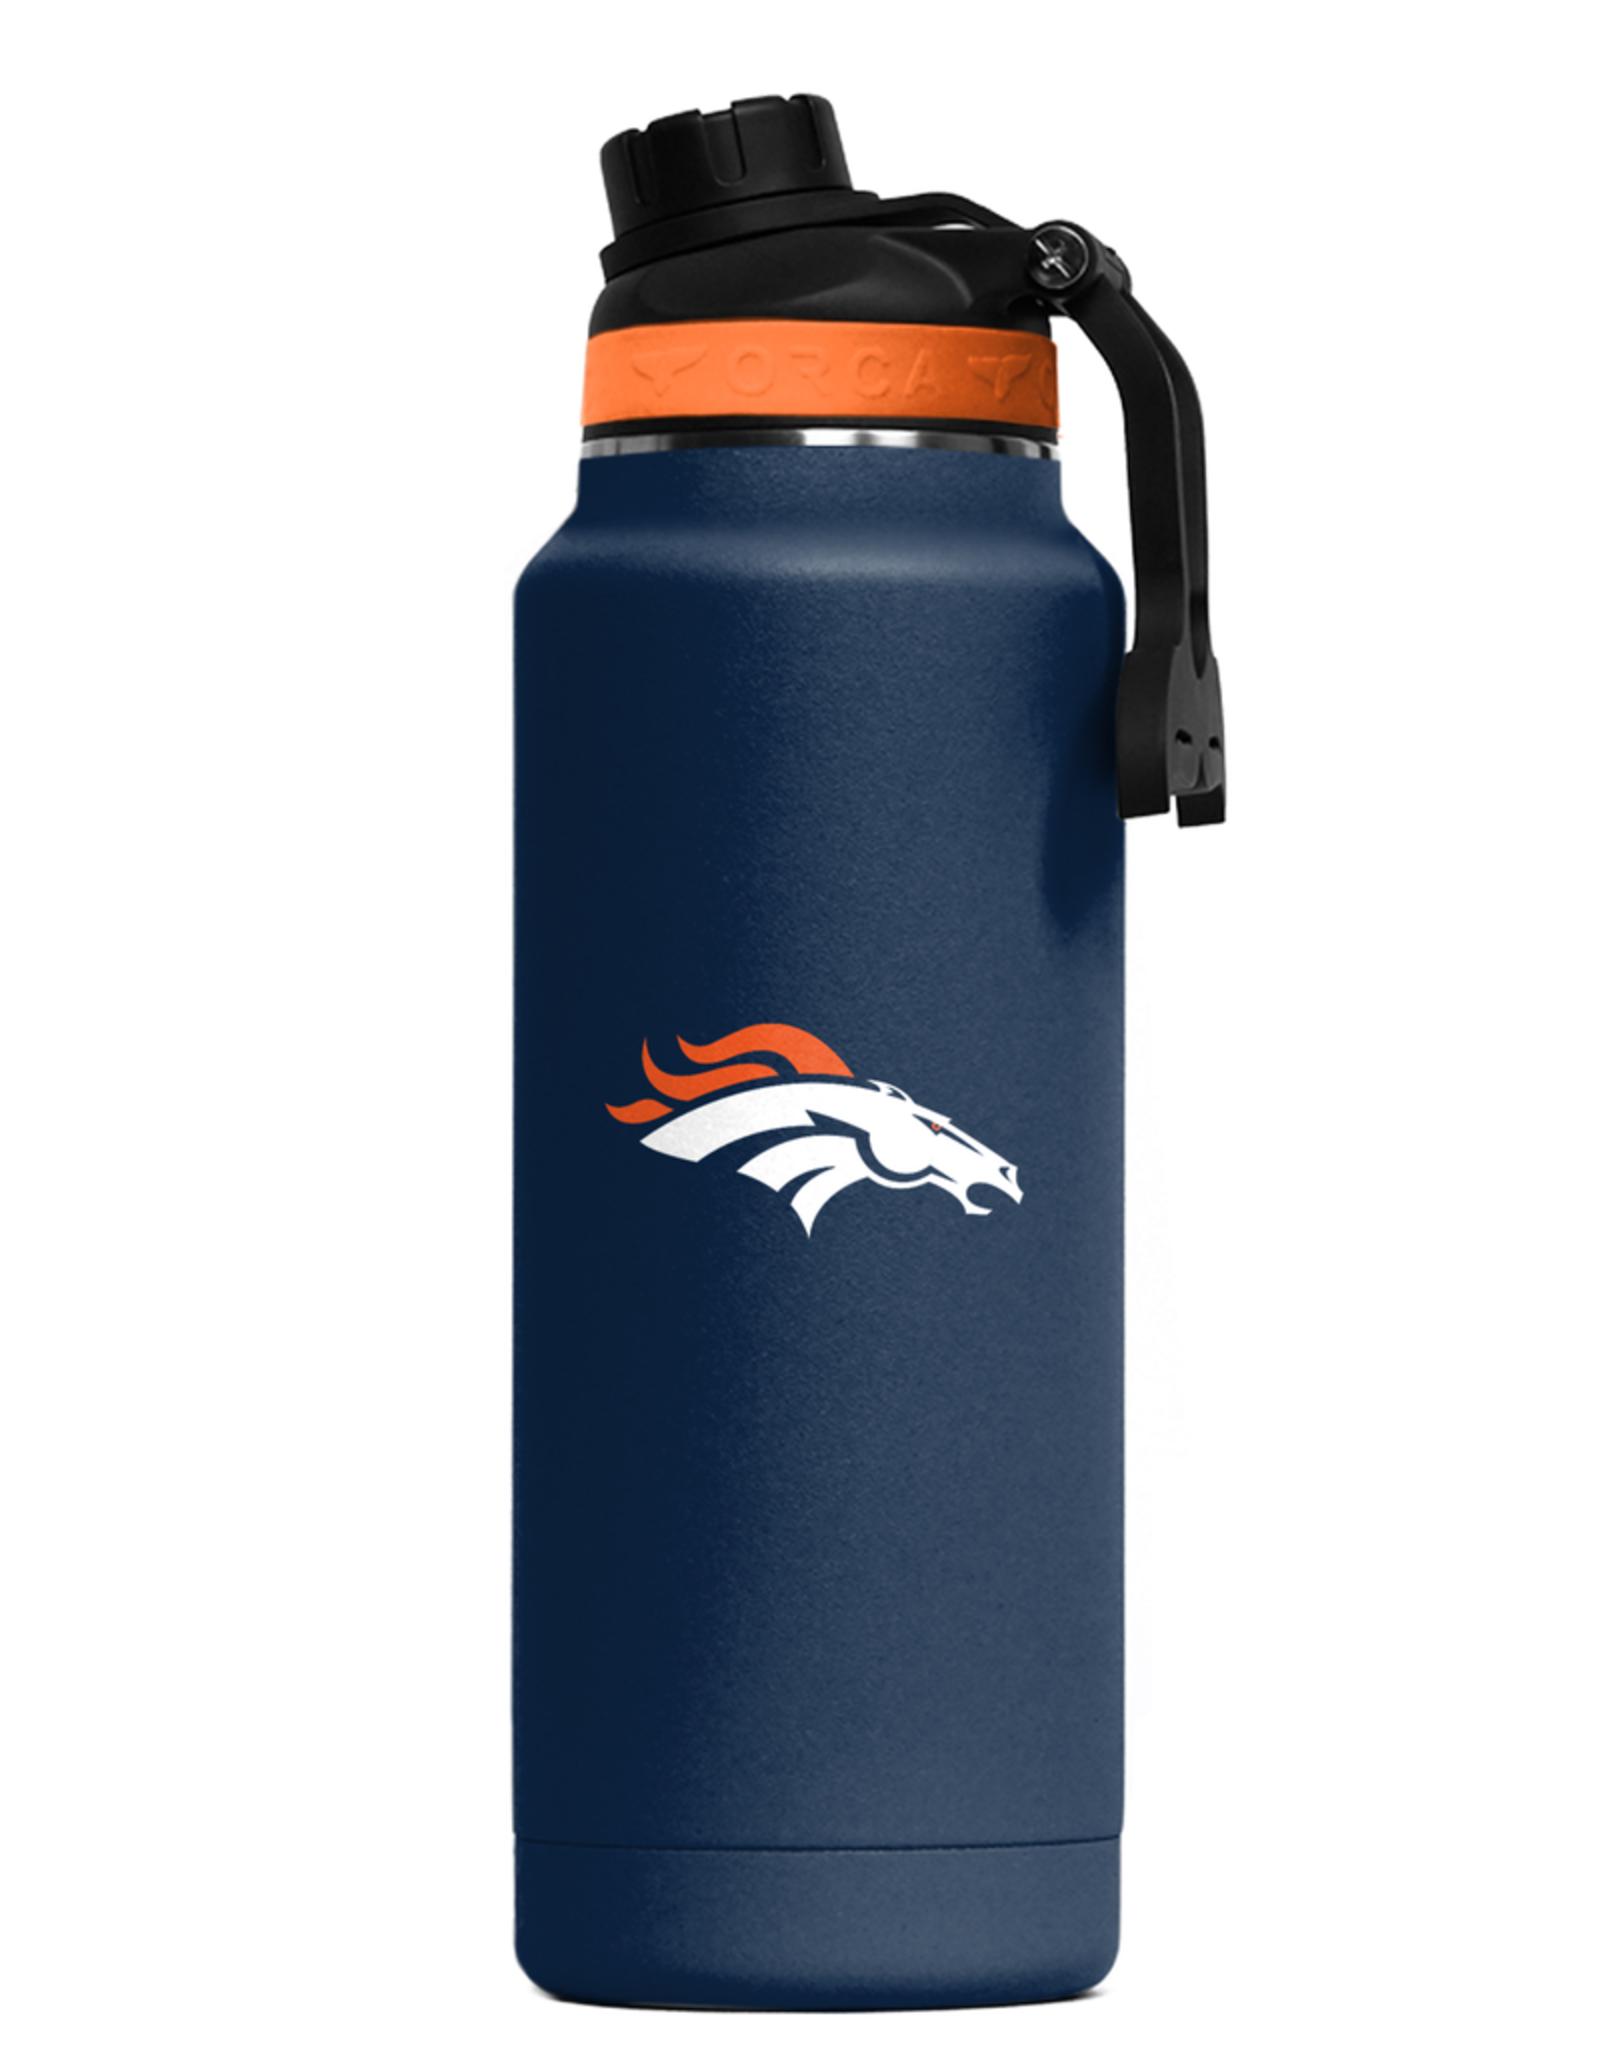 ORCA COOLERS Denver Broncos Orca 34oz Hydra Bottle